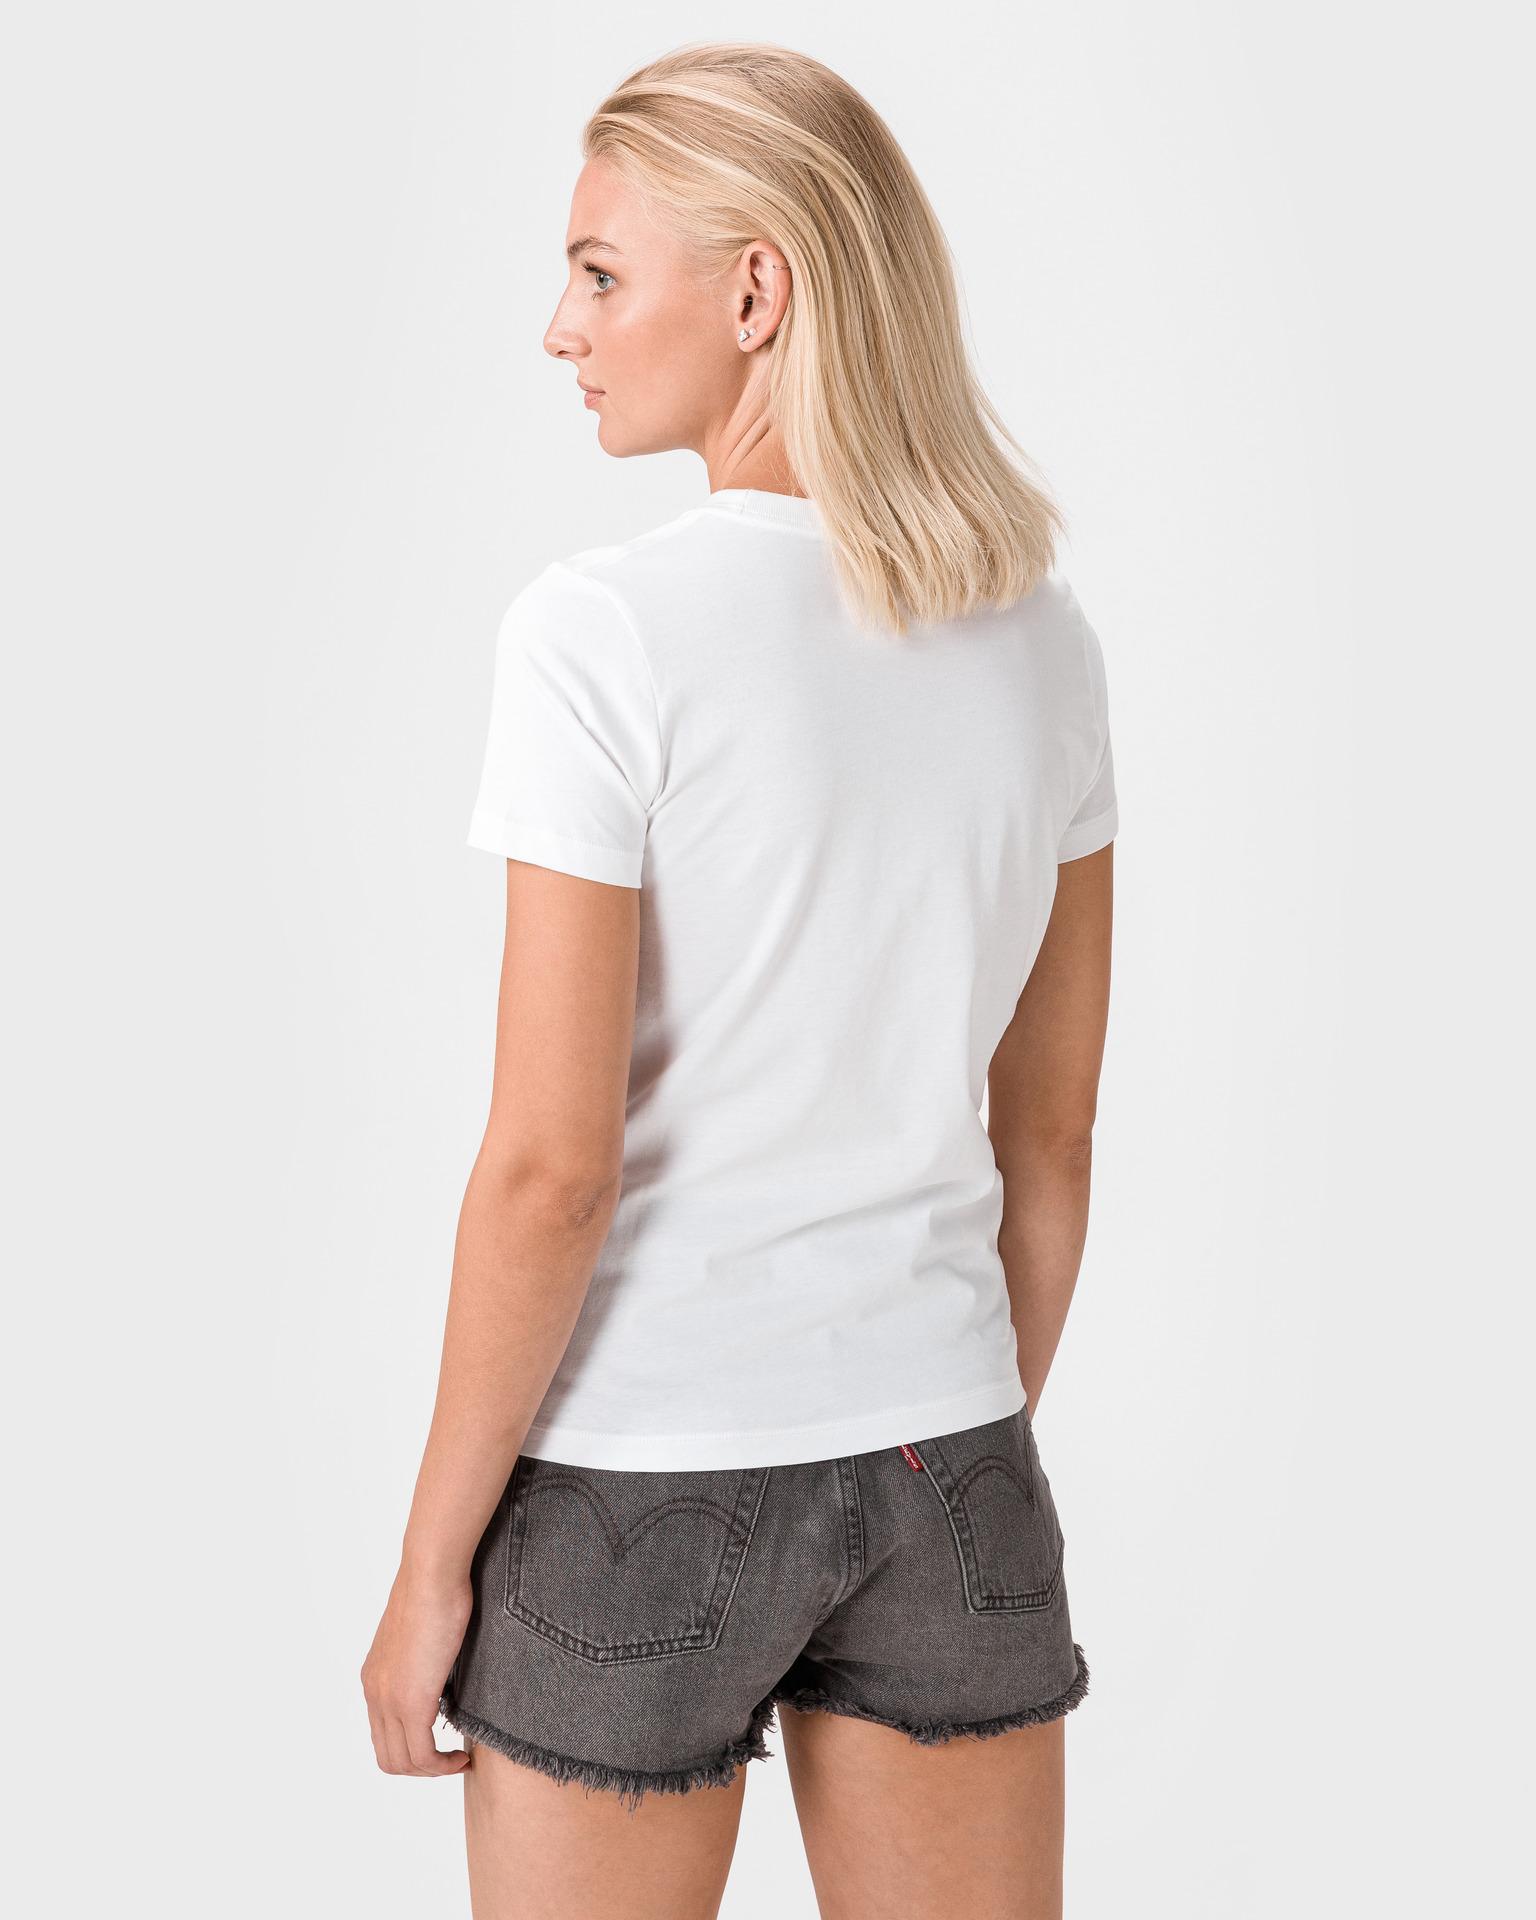 Converse bianco da donna maglietta